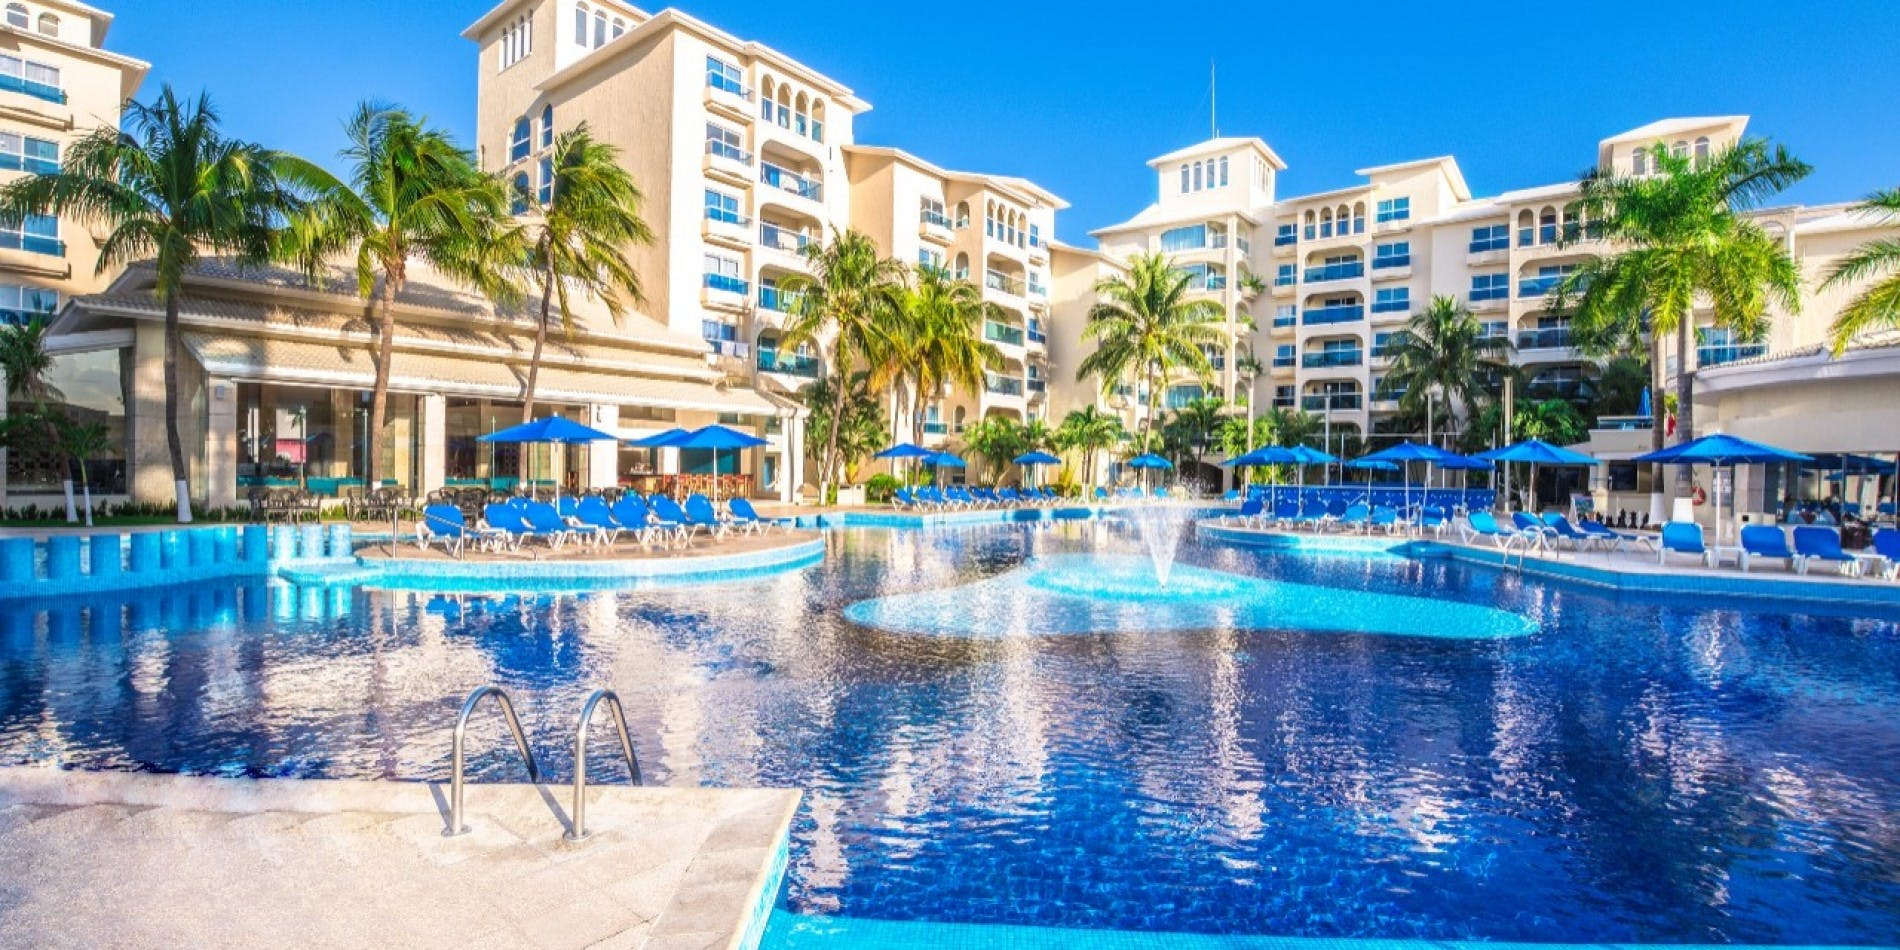 Occidental Costa Cancún pool